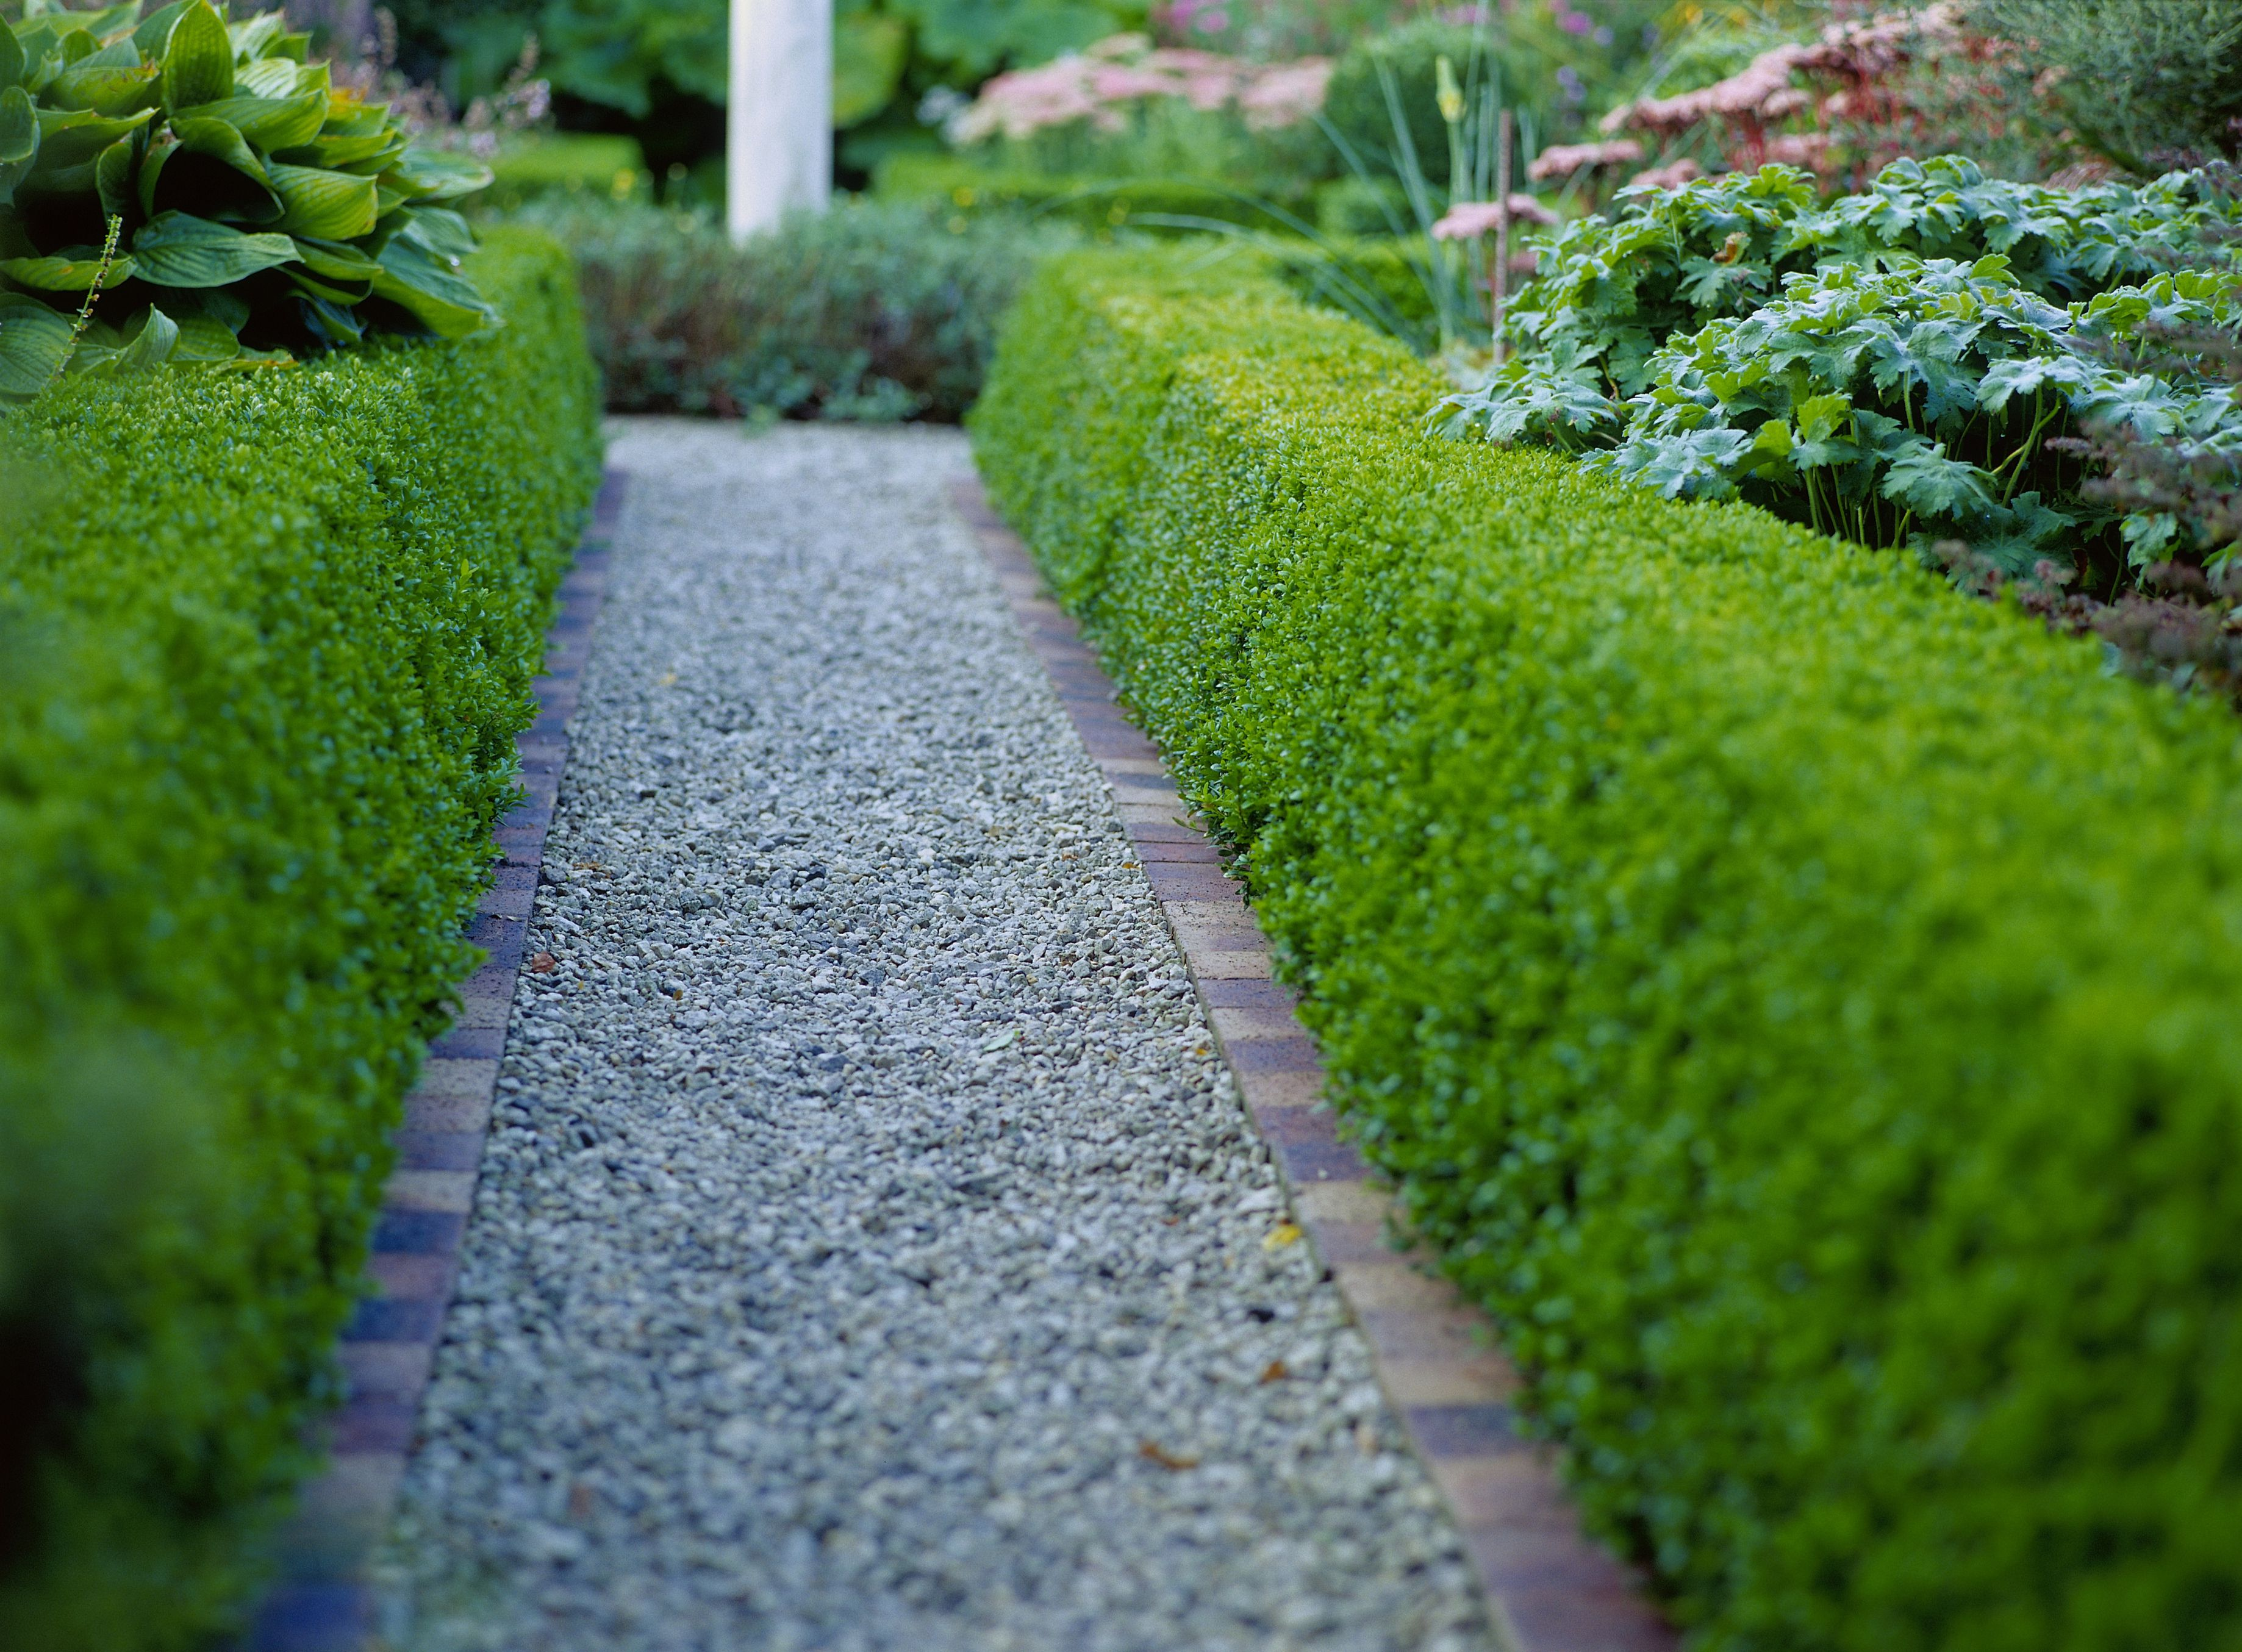 The Best Shrubs For Making Hedges